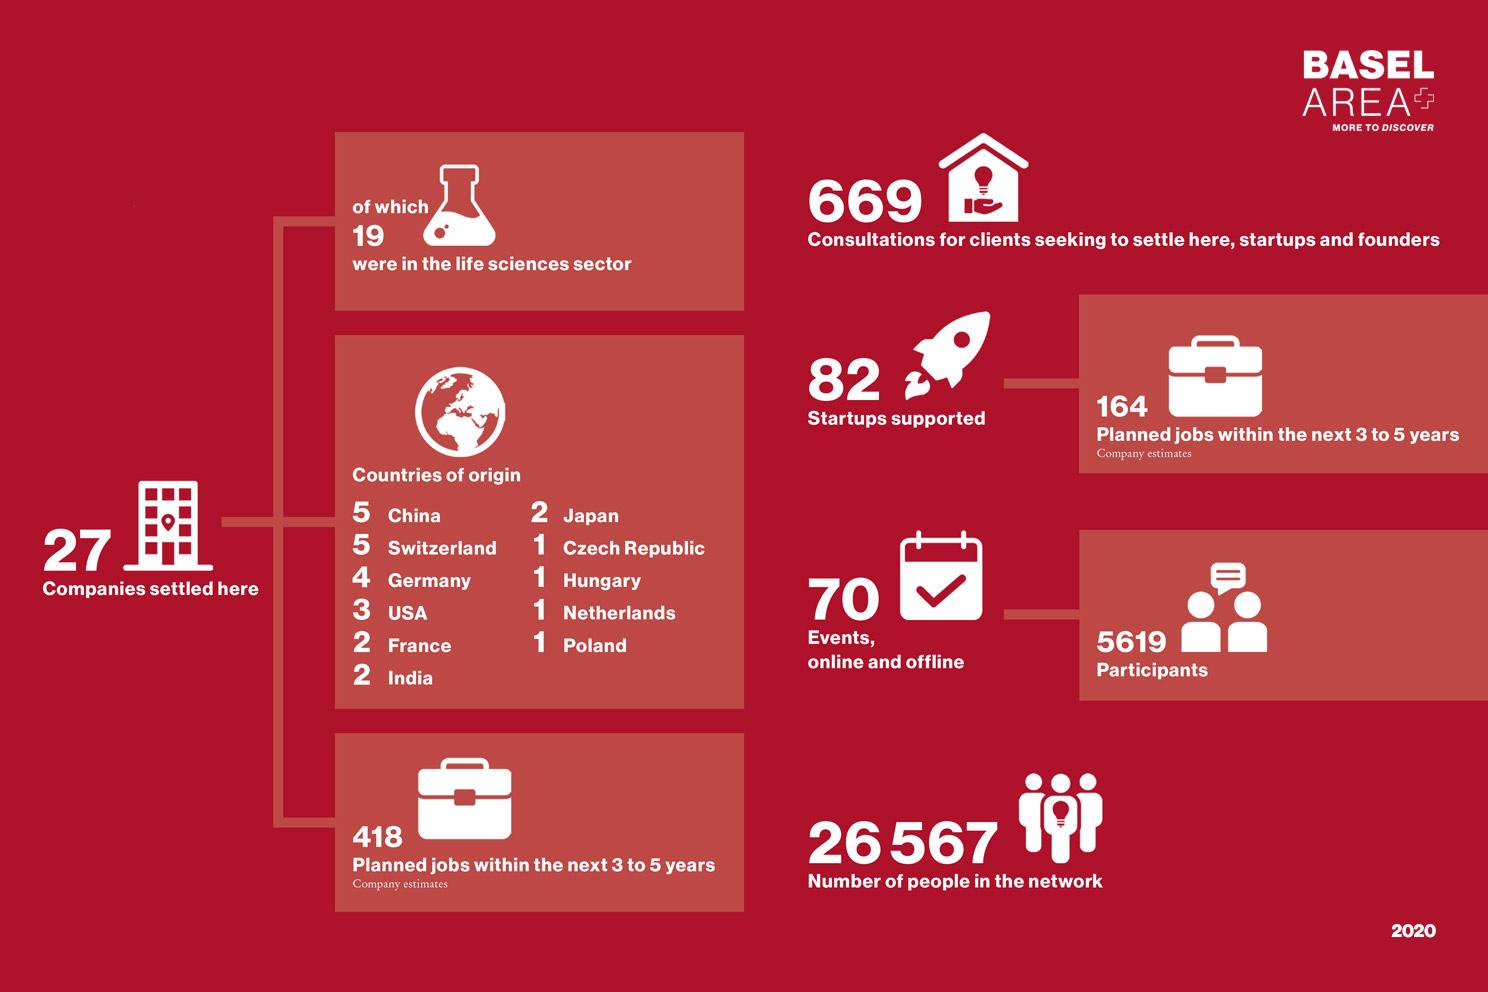 Infographic achivements Basel Area Business & Innovation 2020-EN